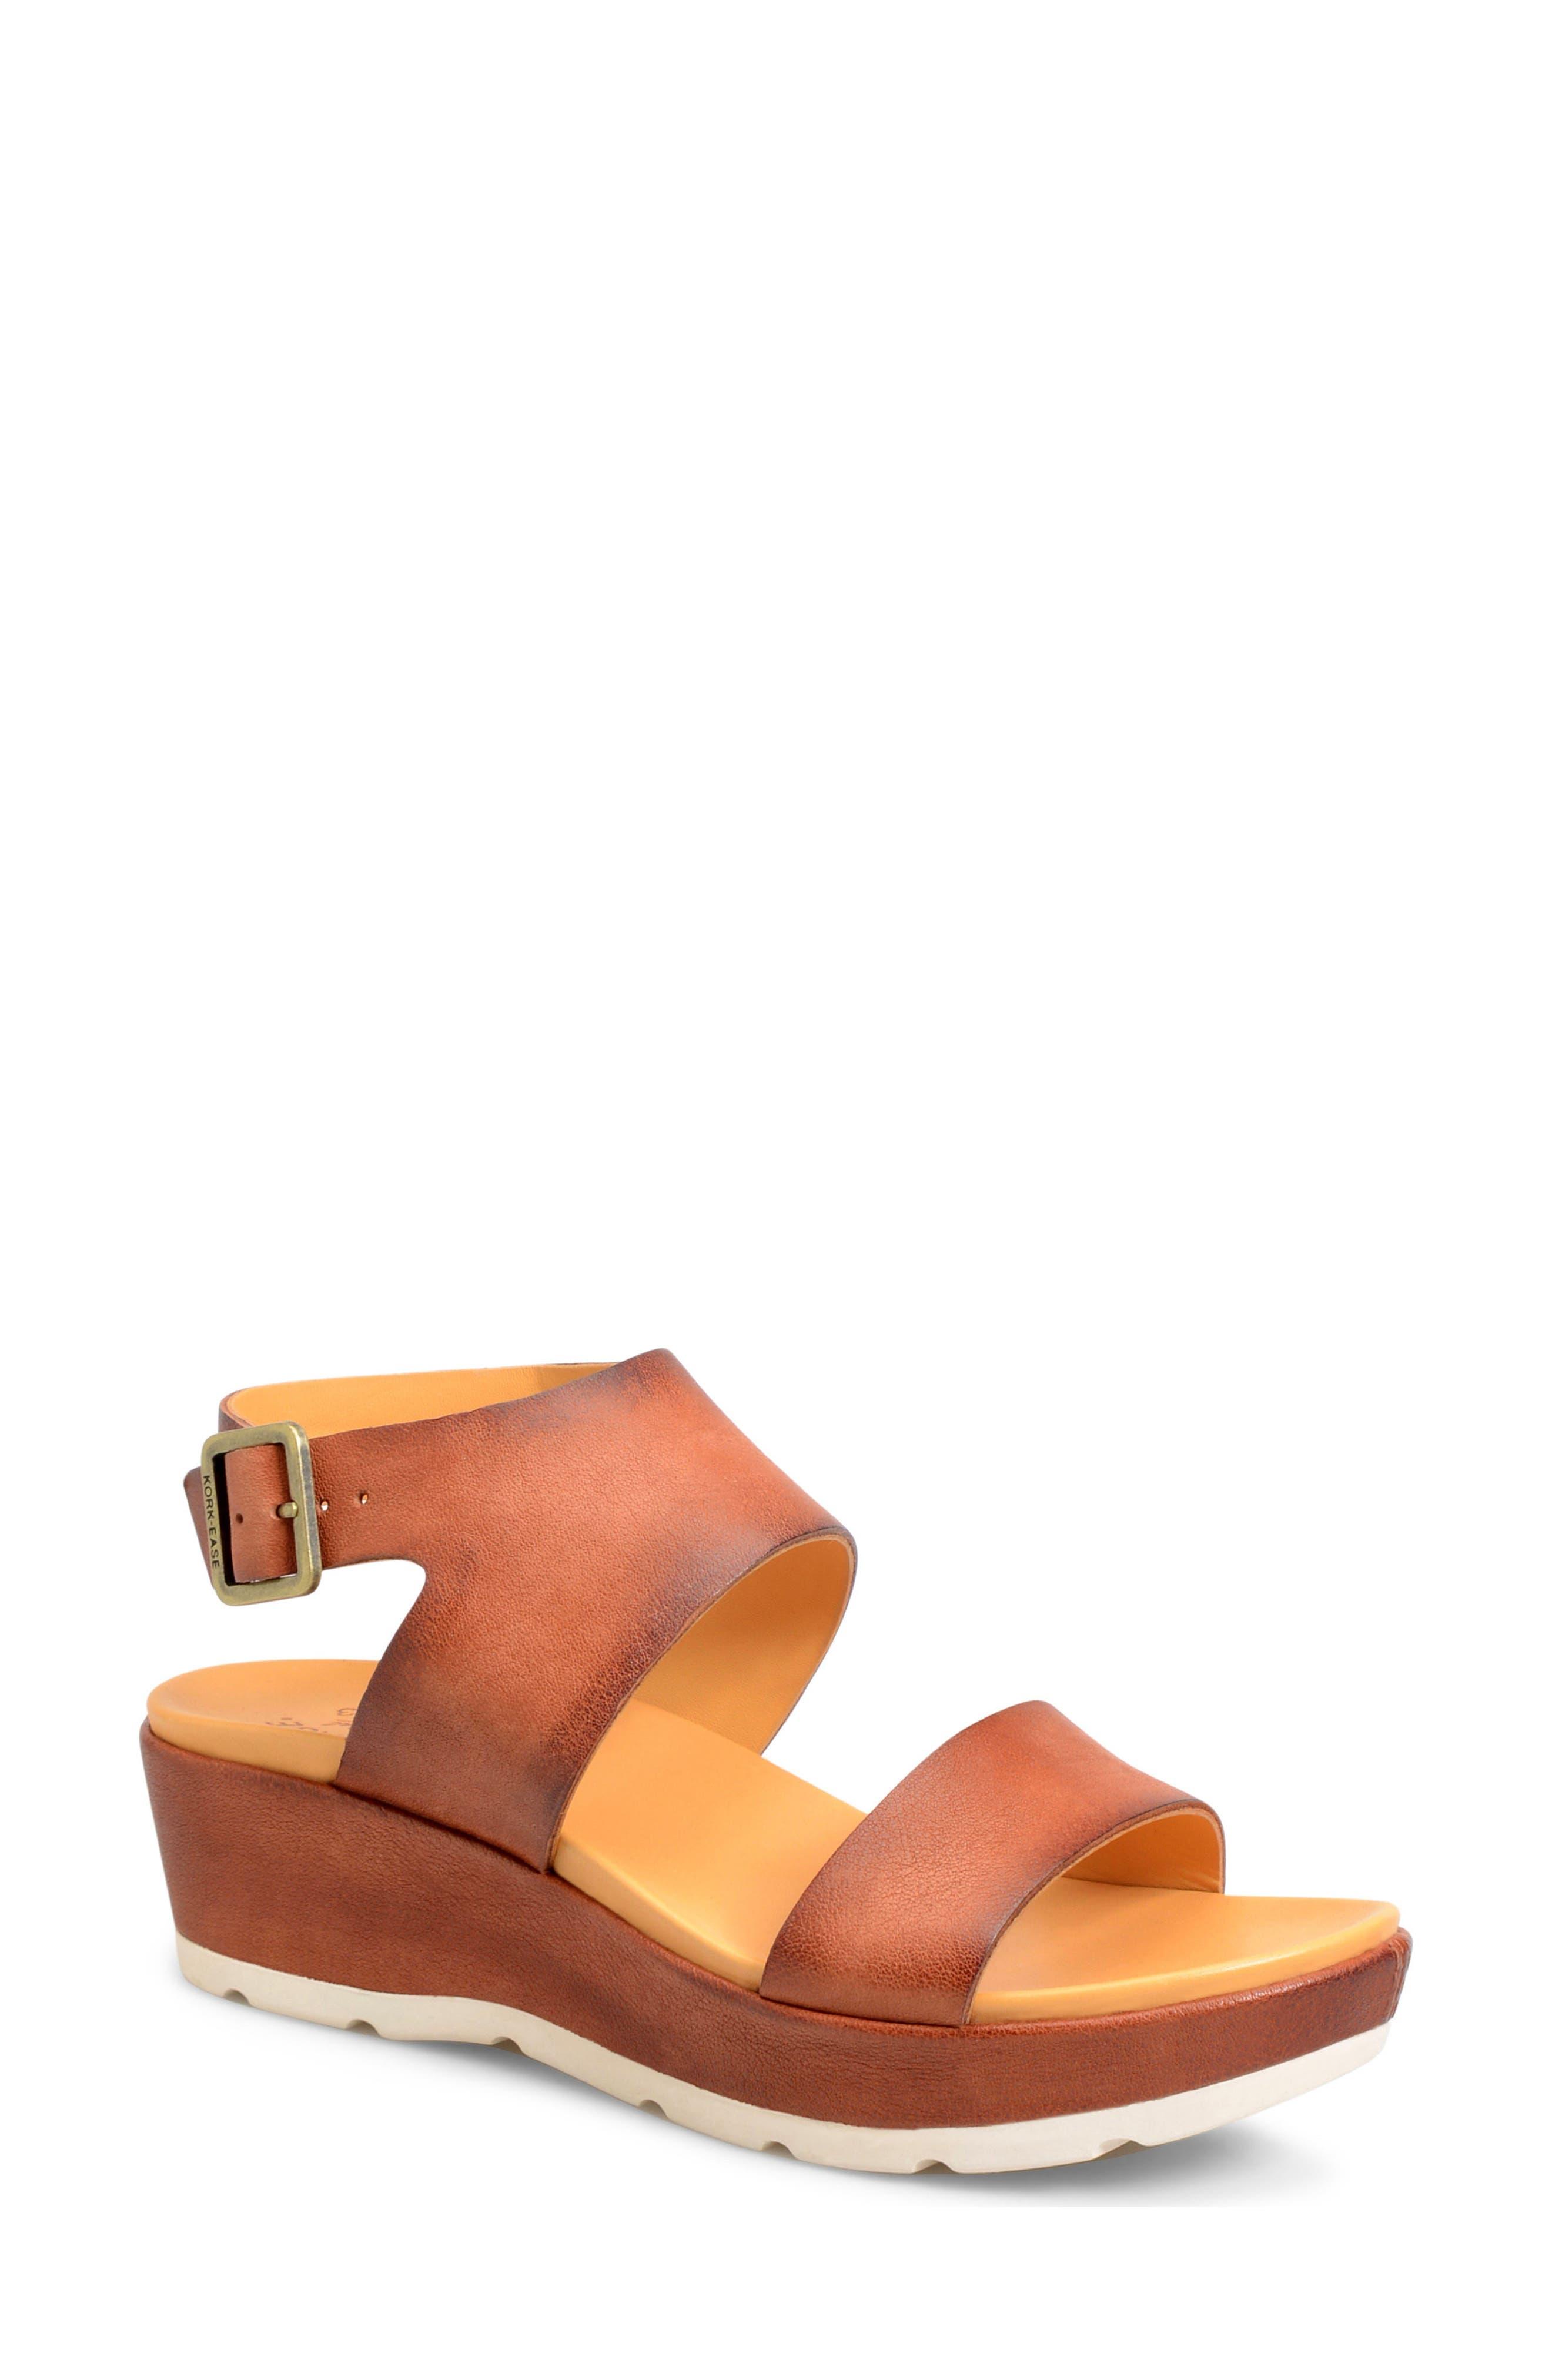 KORK-EASE® 'Khloe' Platform Wedge Sandal